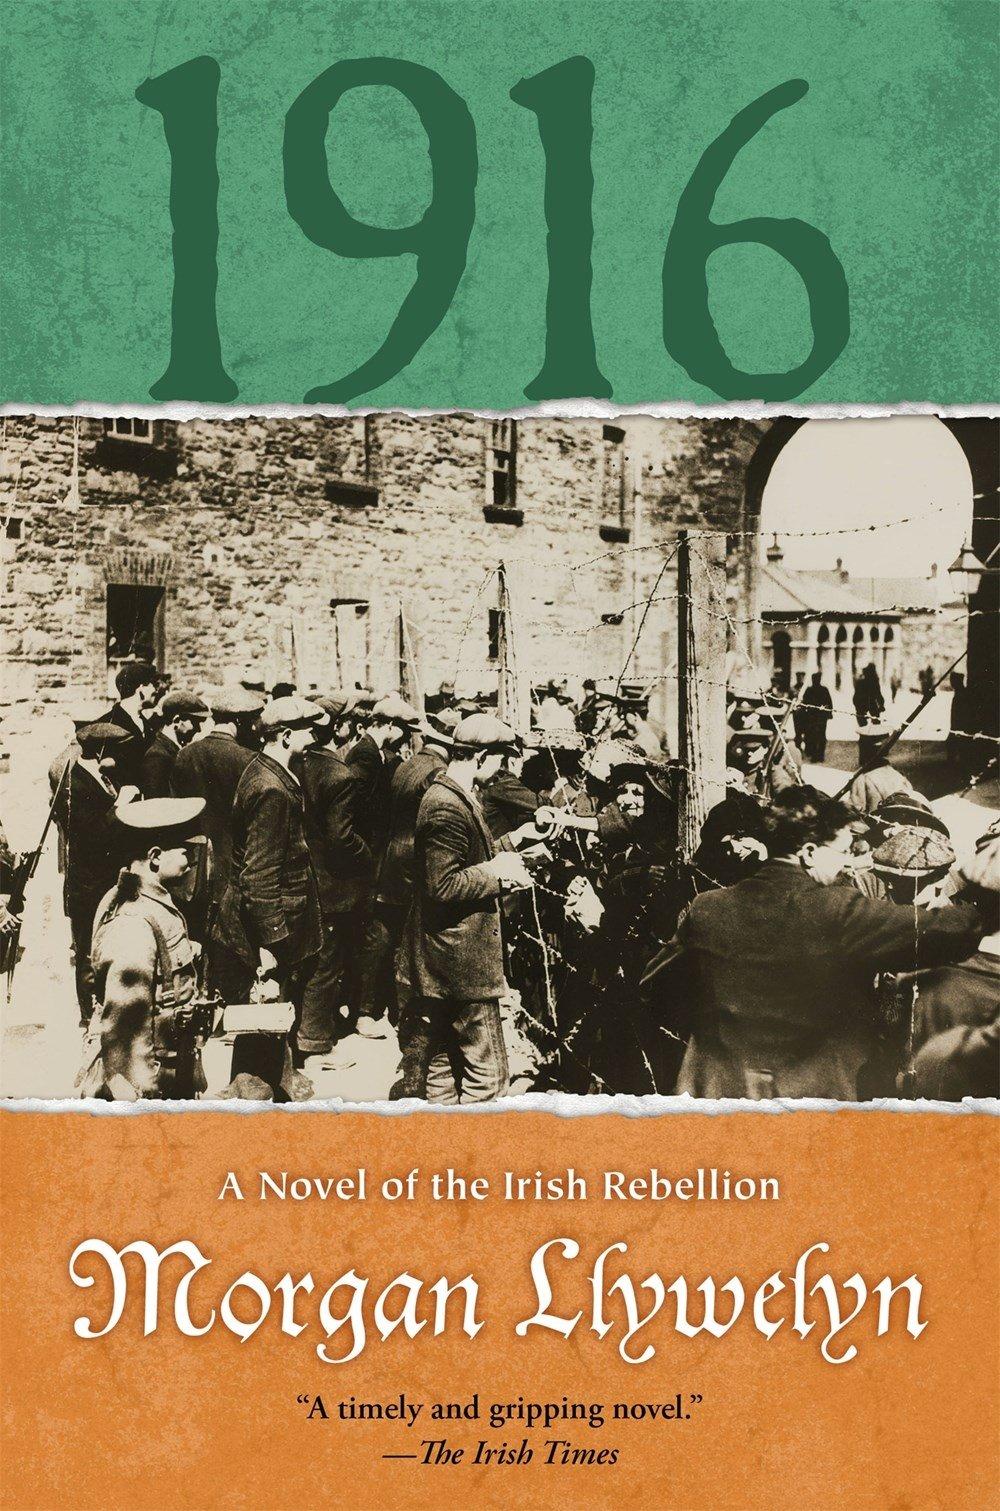 Amazon.com: 1916: A Novel of the Irish Rebellion (Irish Century)  (9780765386144): Morgan Llywelyn: Books